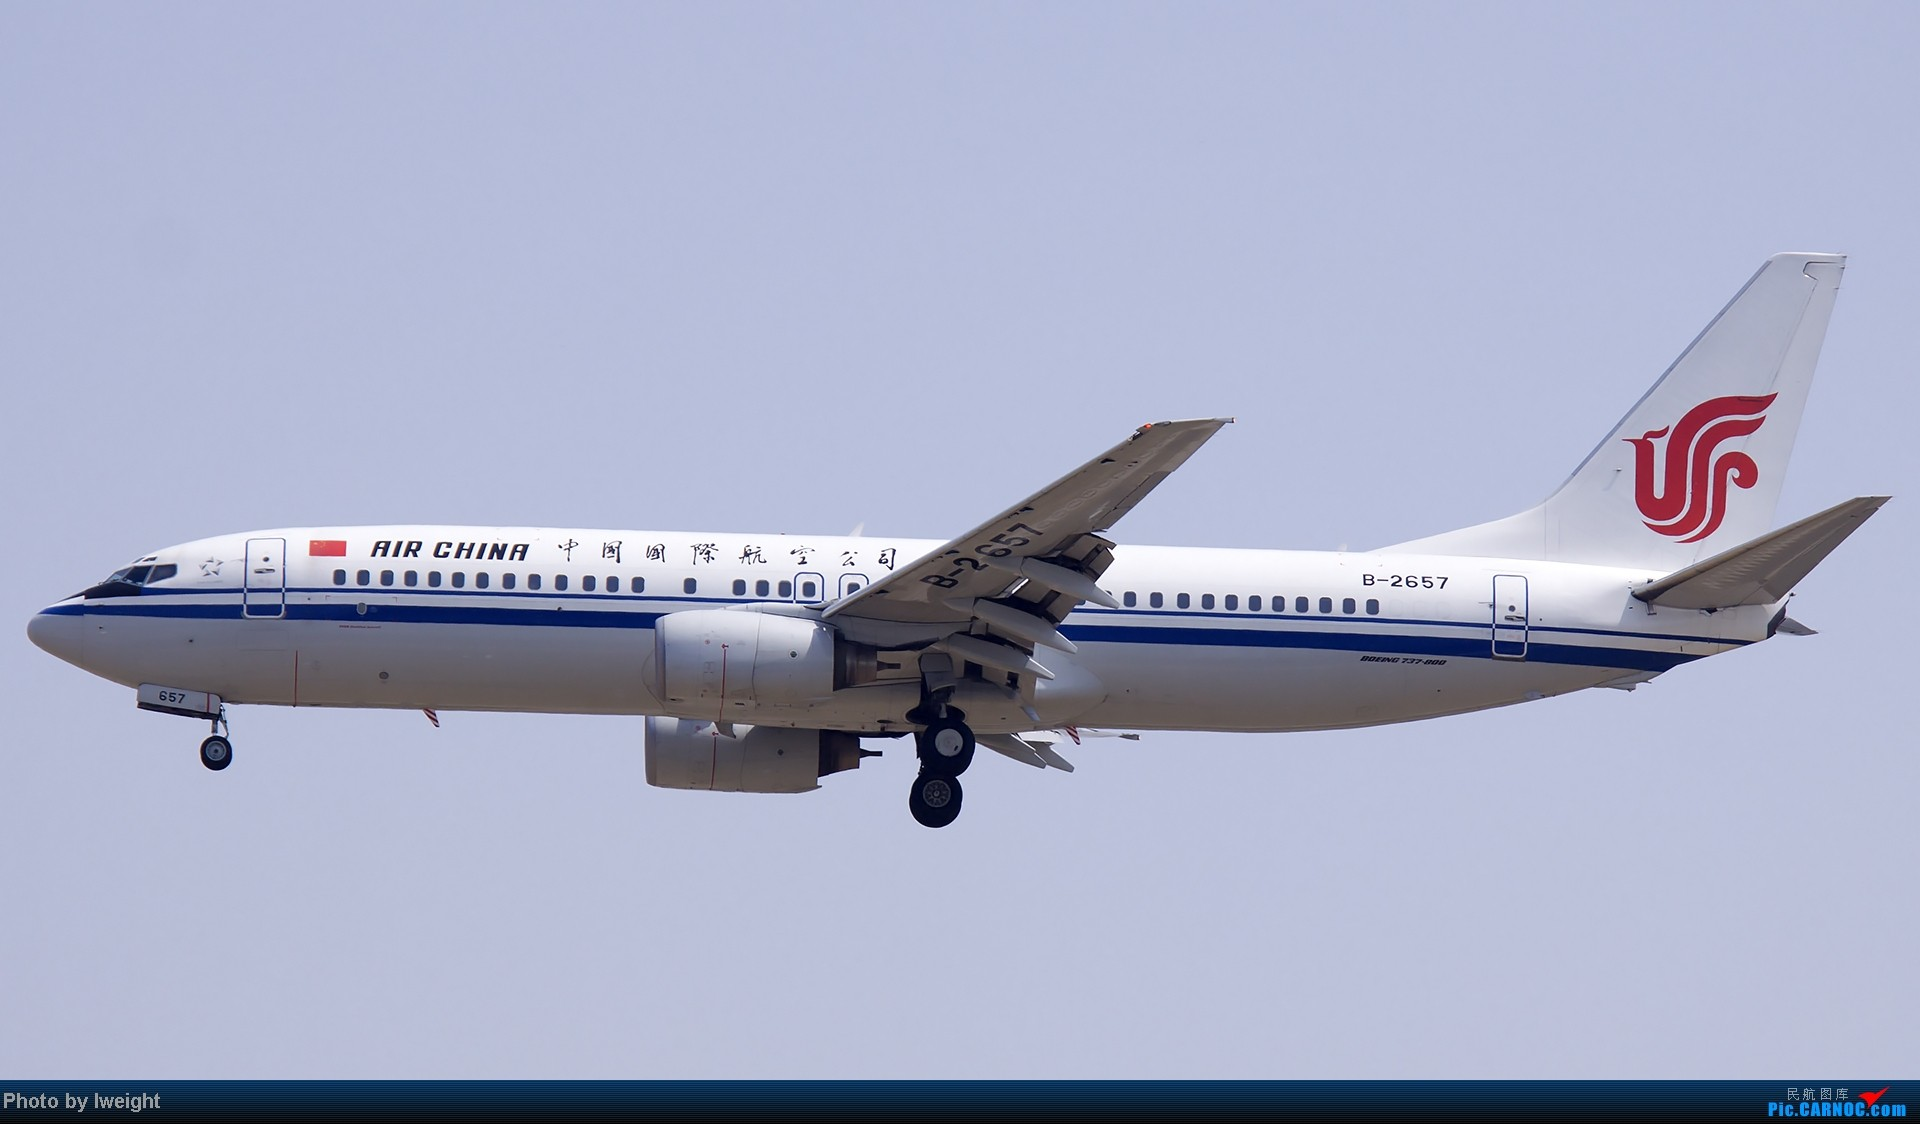 Re:[原创]错过了卡航的巴塞罗那号,只有这些大路货了,泪奔啊 BOEING 737-800 B-2657 中国北京首都机场